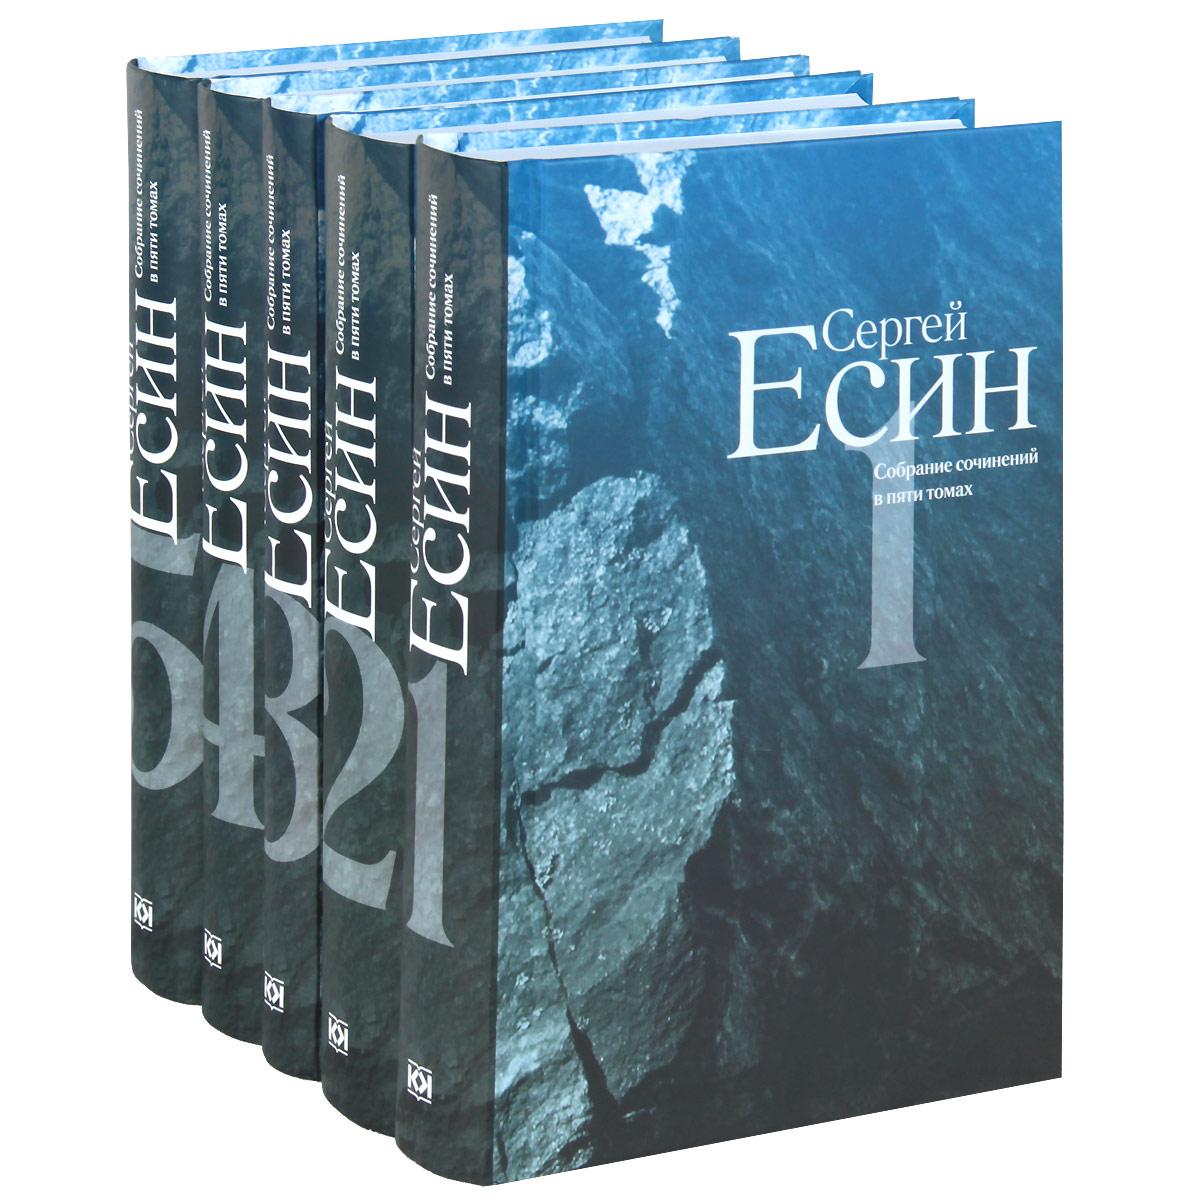 Сергей Есин Сергей Есин. Собрание сочинений (комплект из 5 книг)